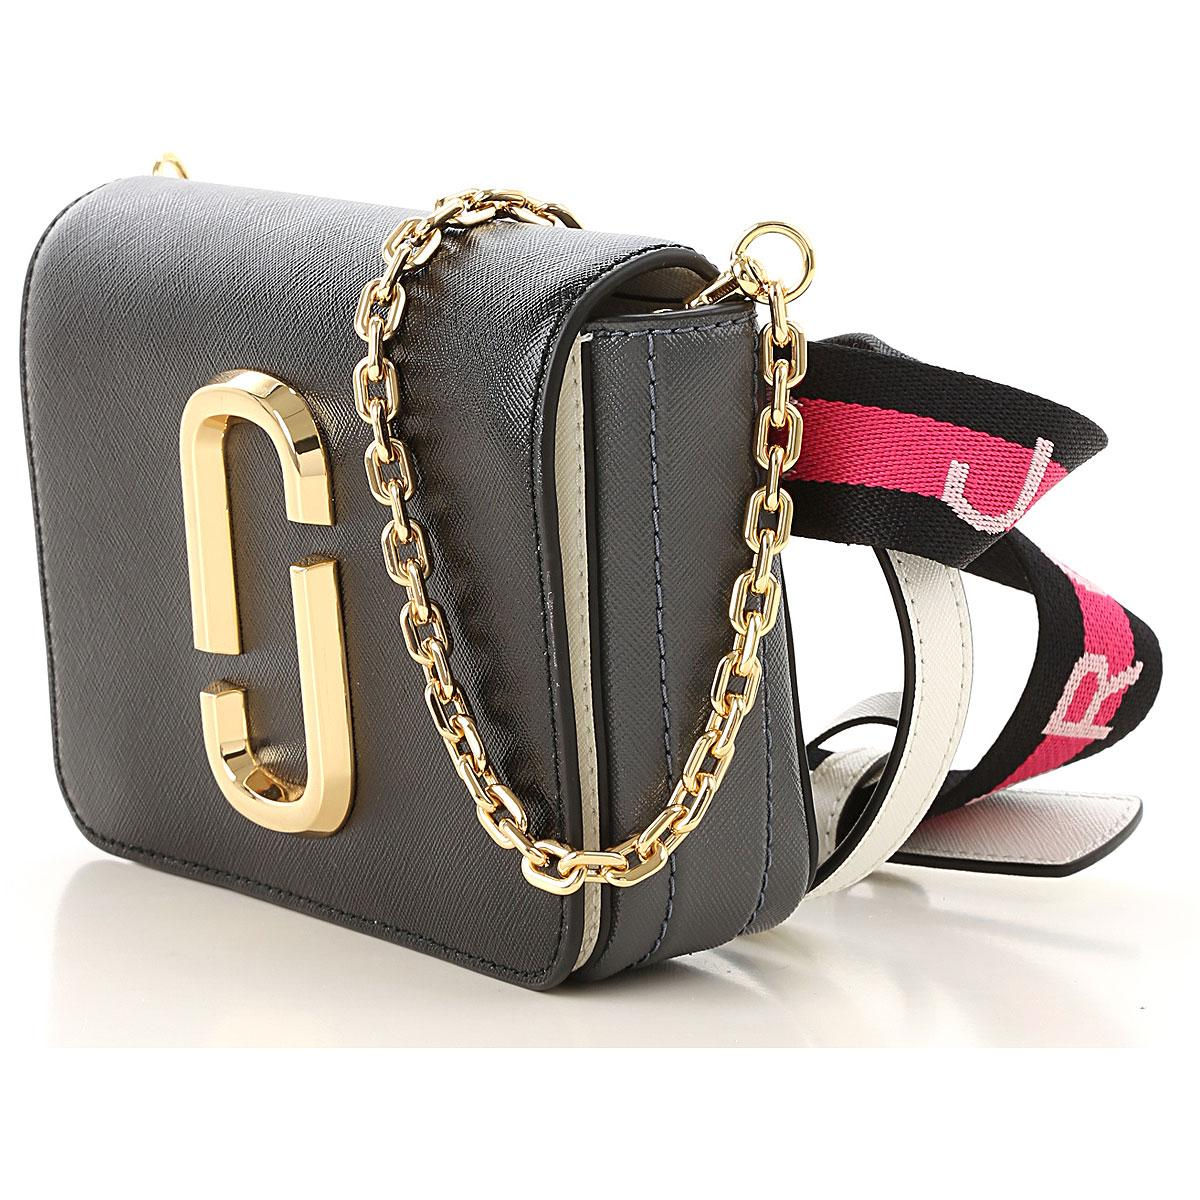 Alexander McQueen Shoulder Bag For Women On Sale in Black